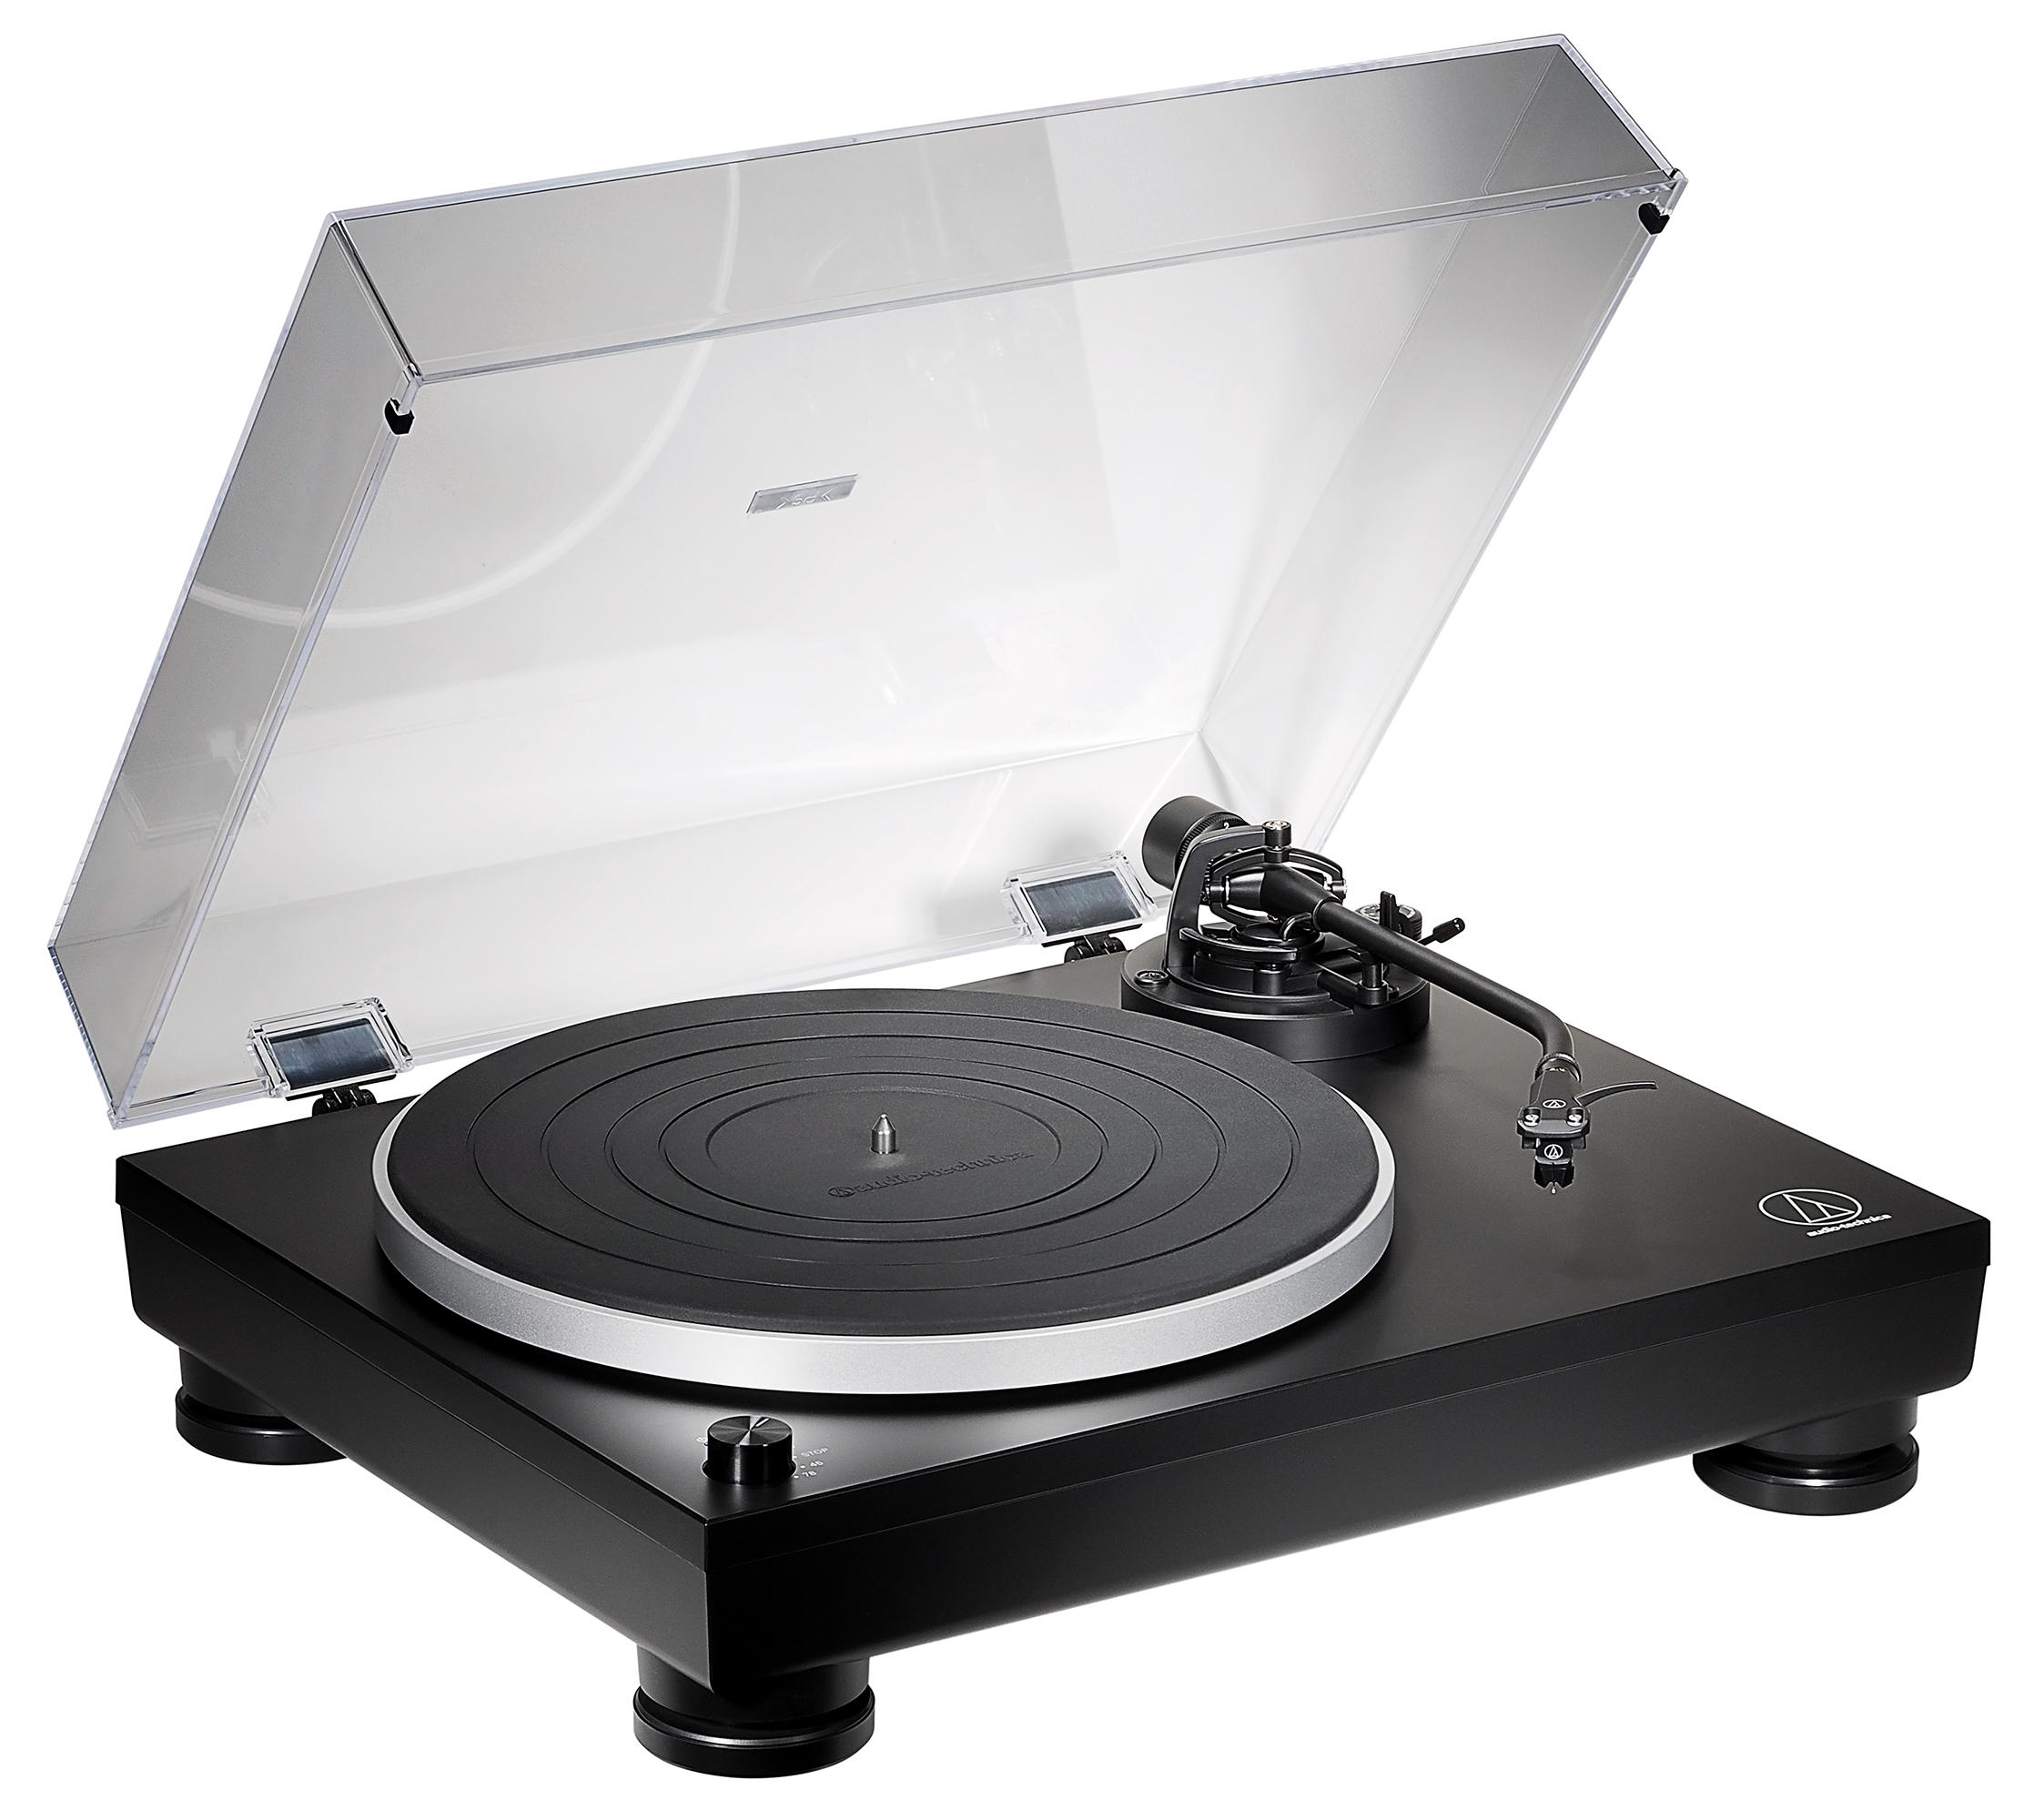 Audio Technica Turntable Singapore, Audio Technica AT-LP5X, Vinyl Player